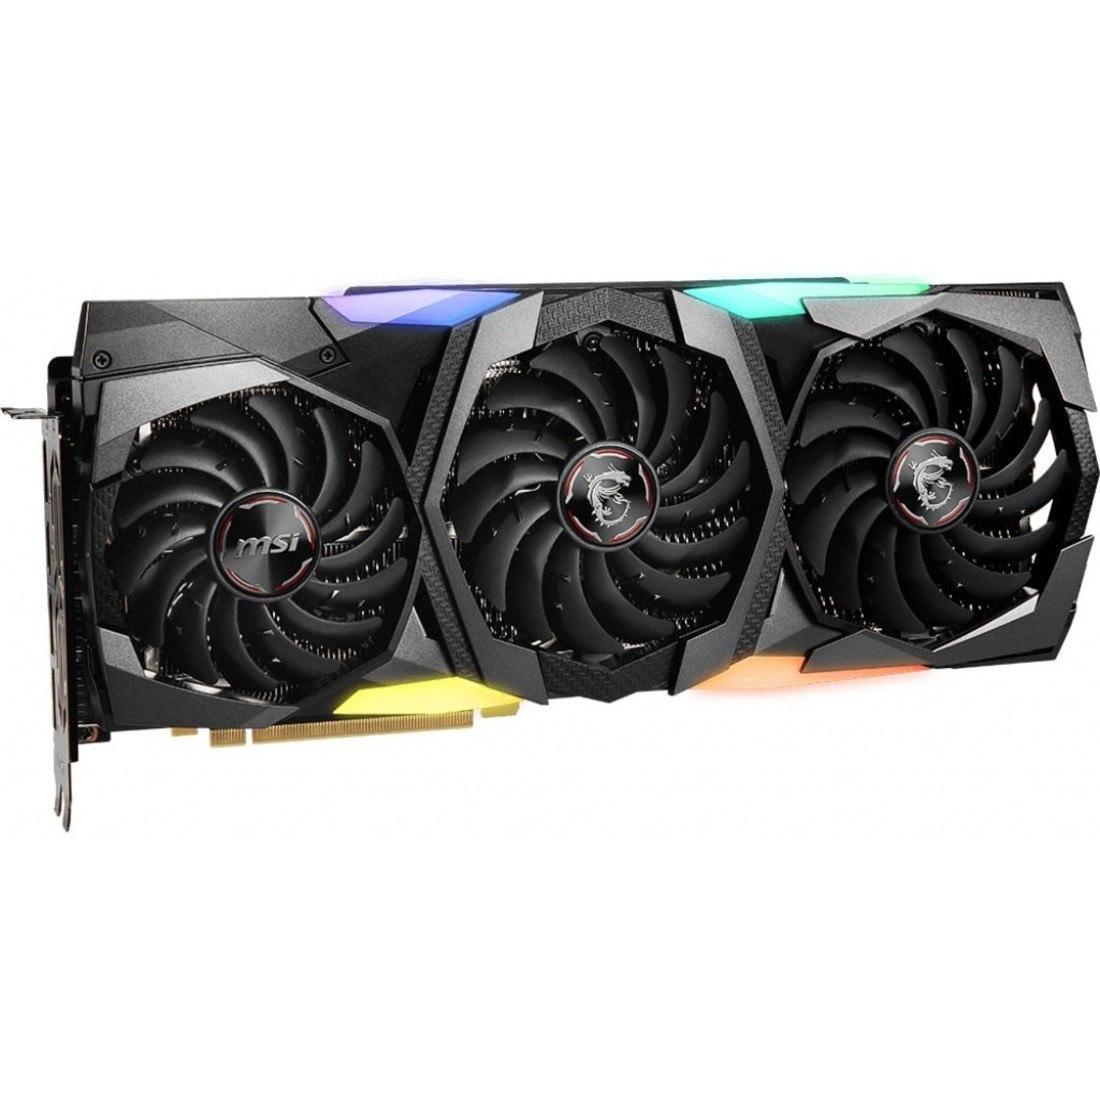 MSI GeForce RTX 2070 SUPER GAMING X TRIO GeForce RTX 2070 SUPER Graphic Card - 8 GB GDDR6